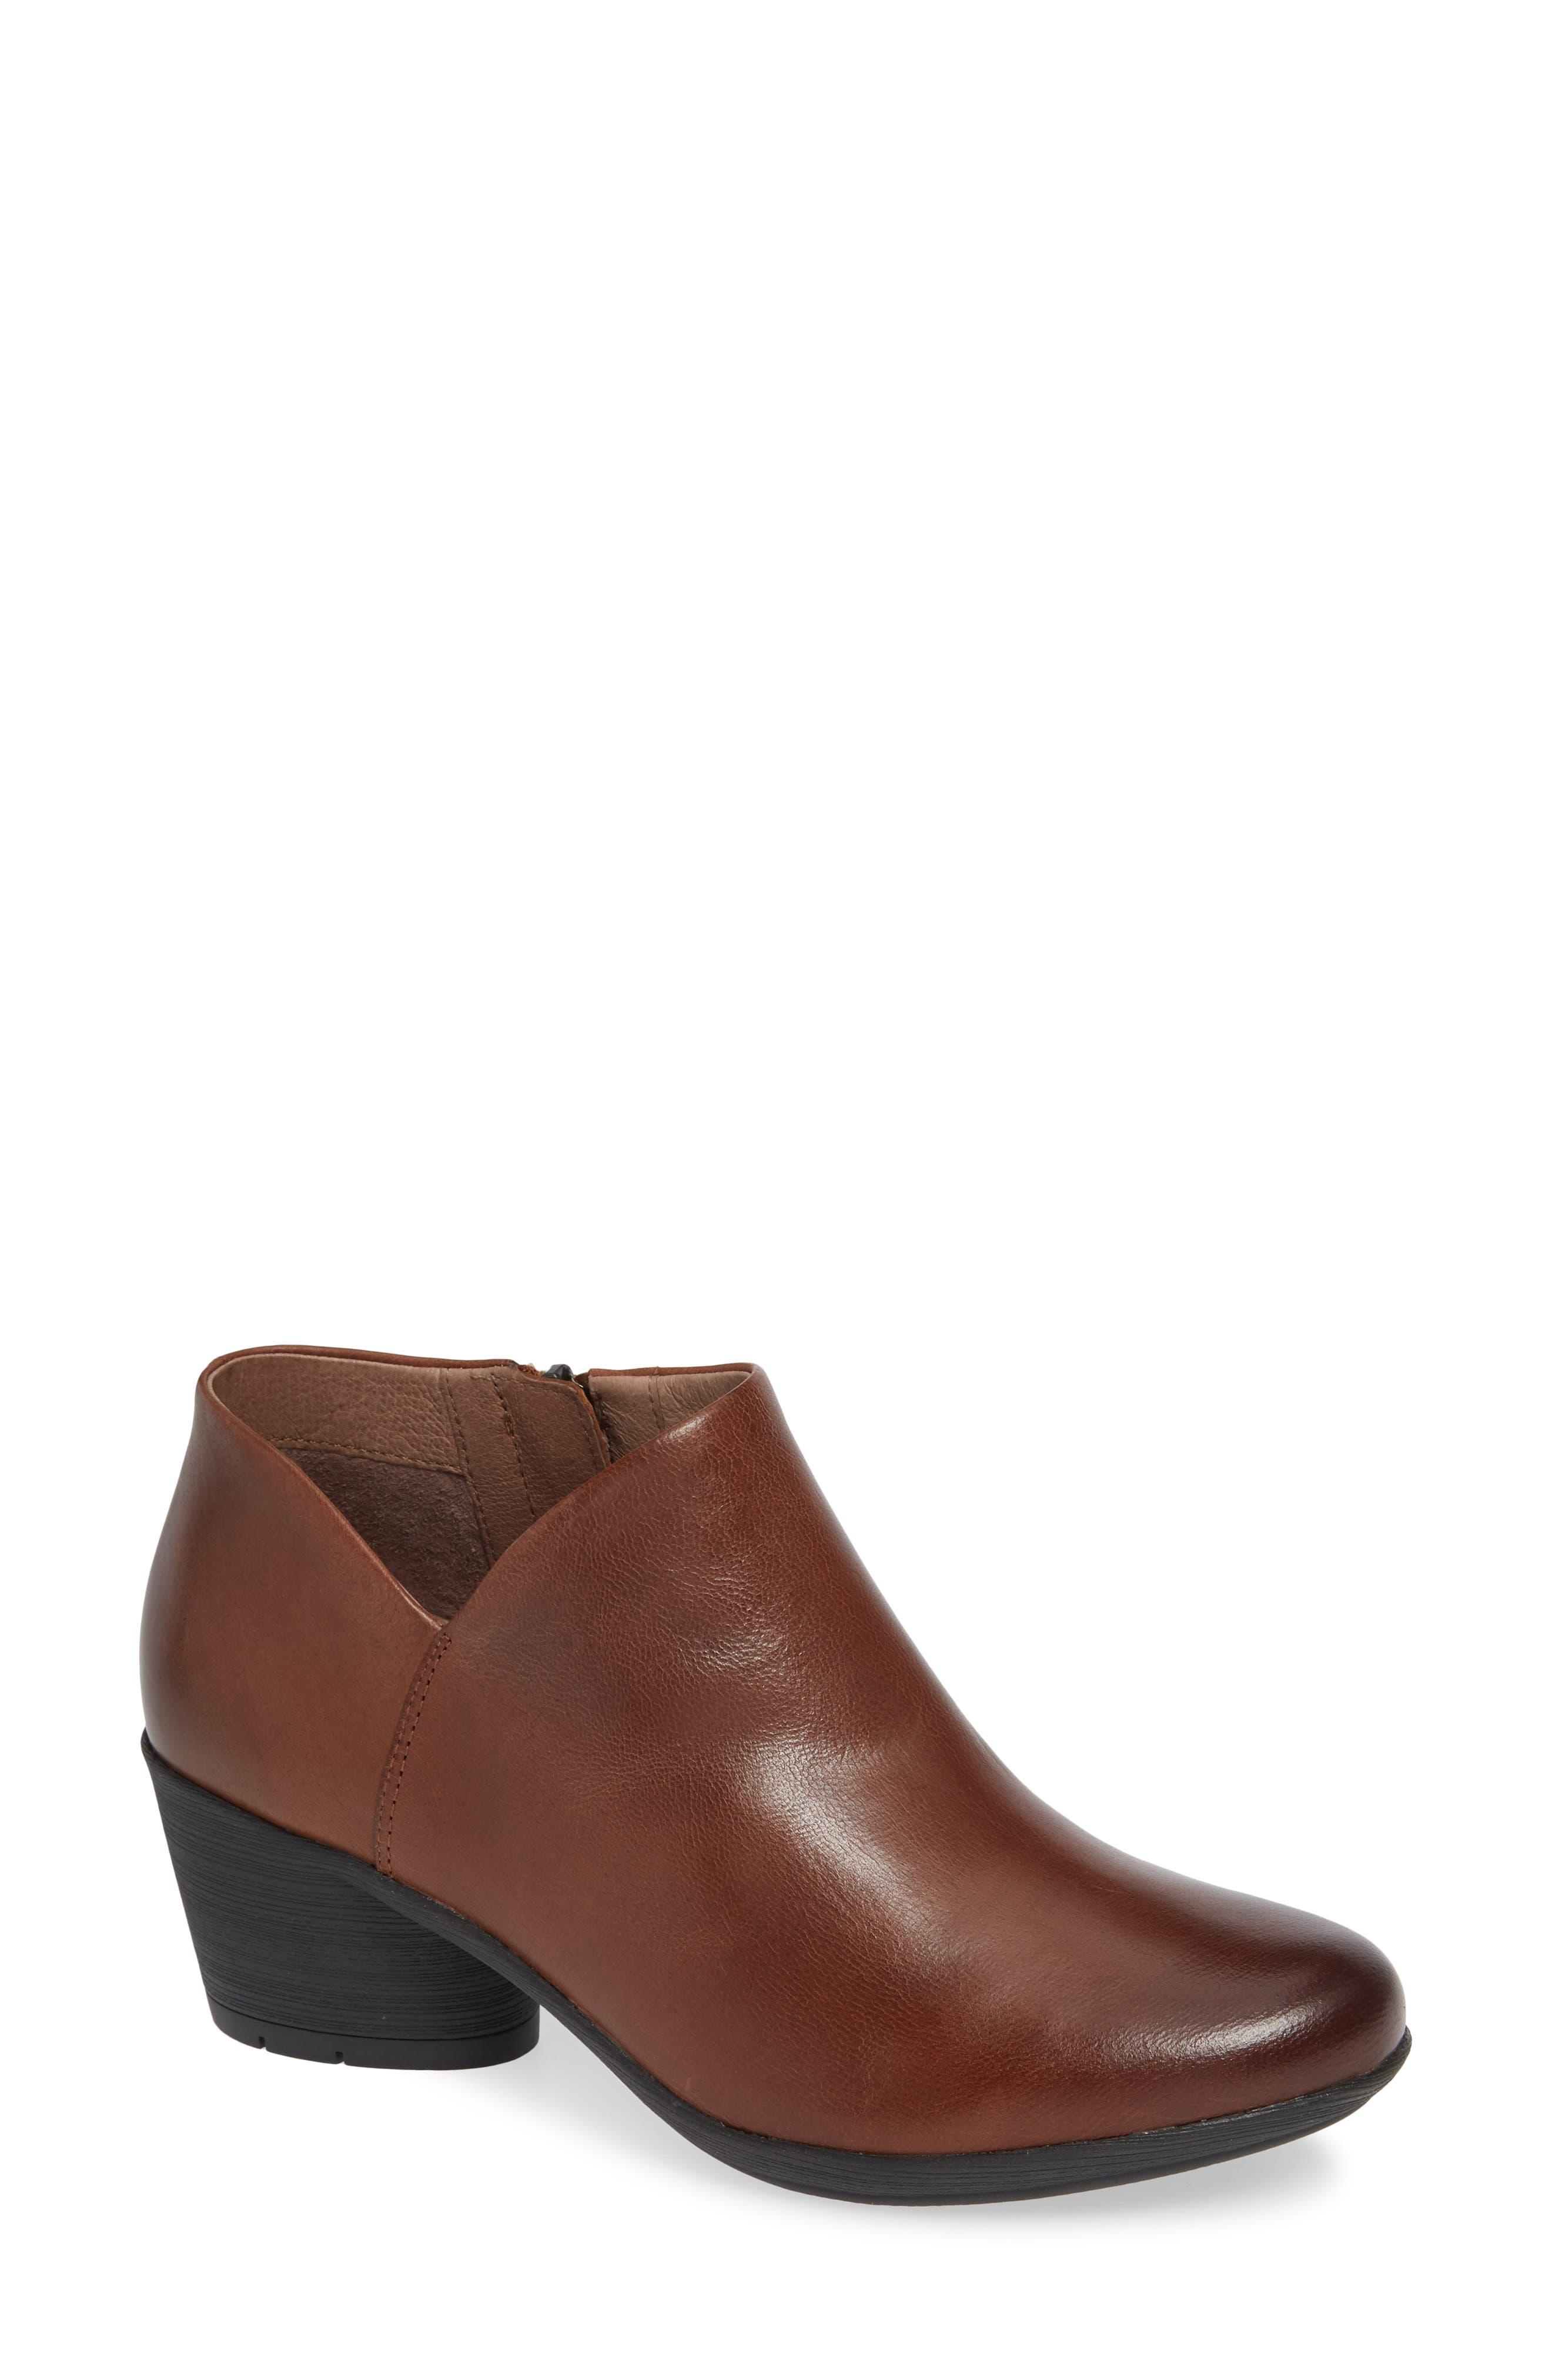 Raina Boot,                         Main,                         color, CHESTNUT NUBUCK